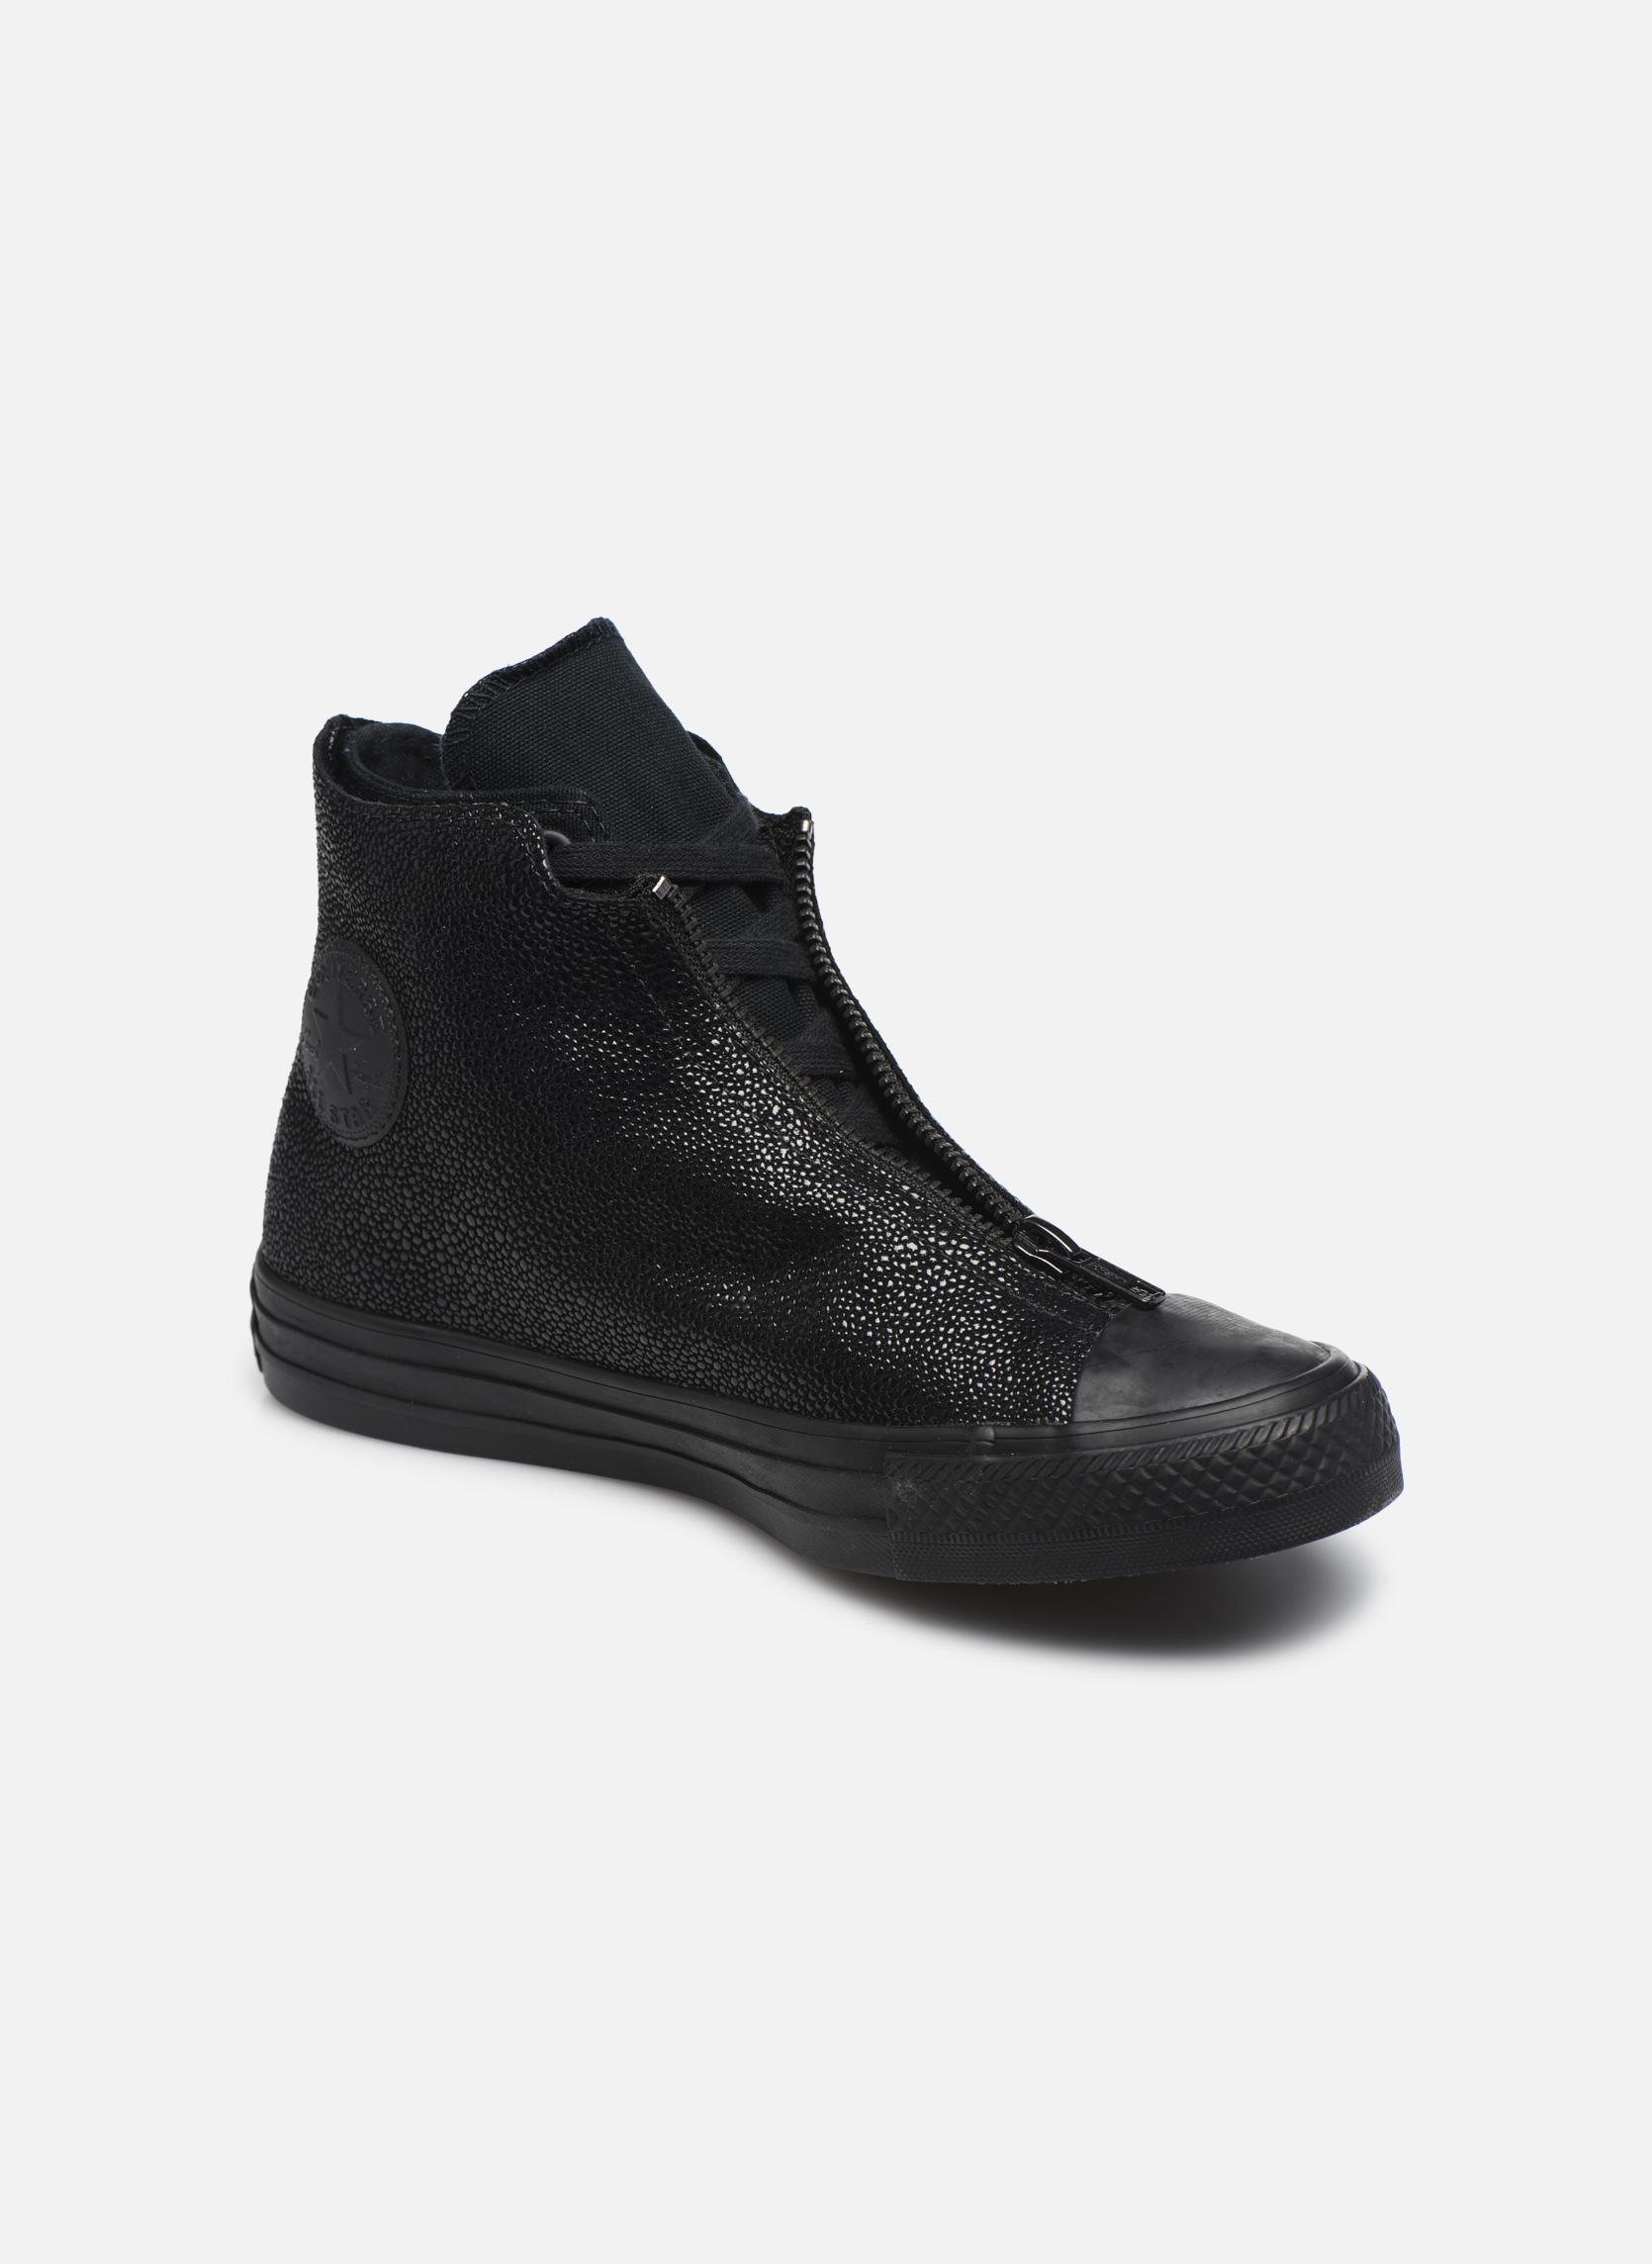 Ctas Classic Shroud Hi Black/black/black